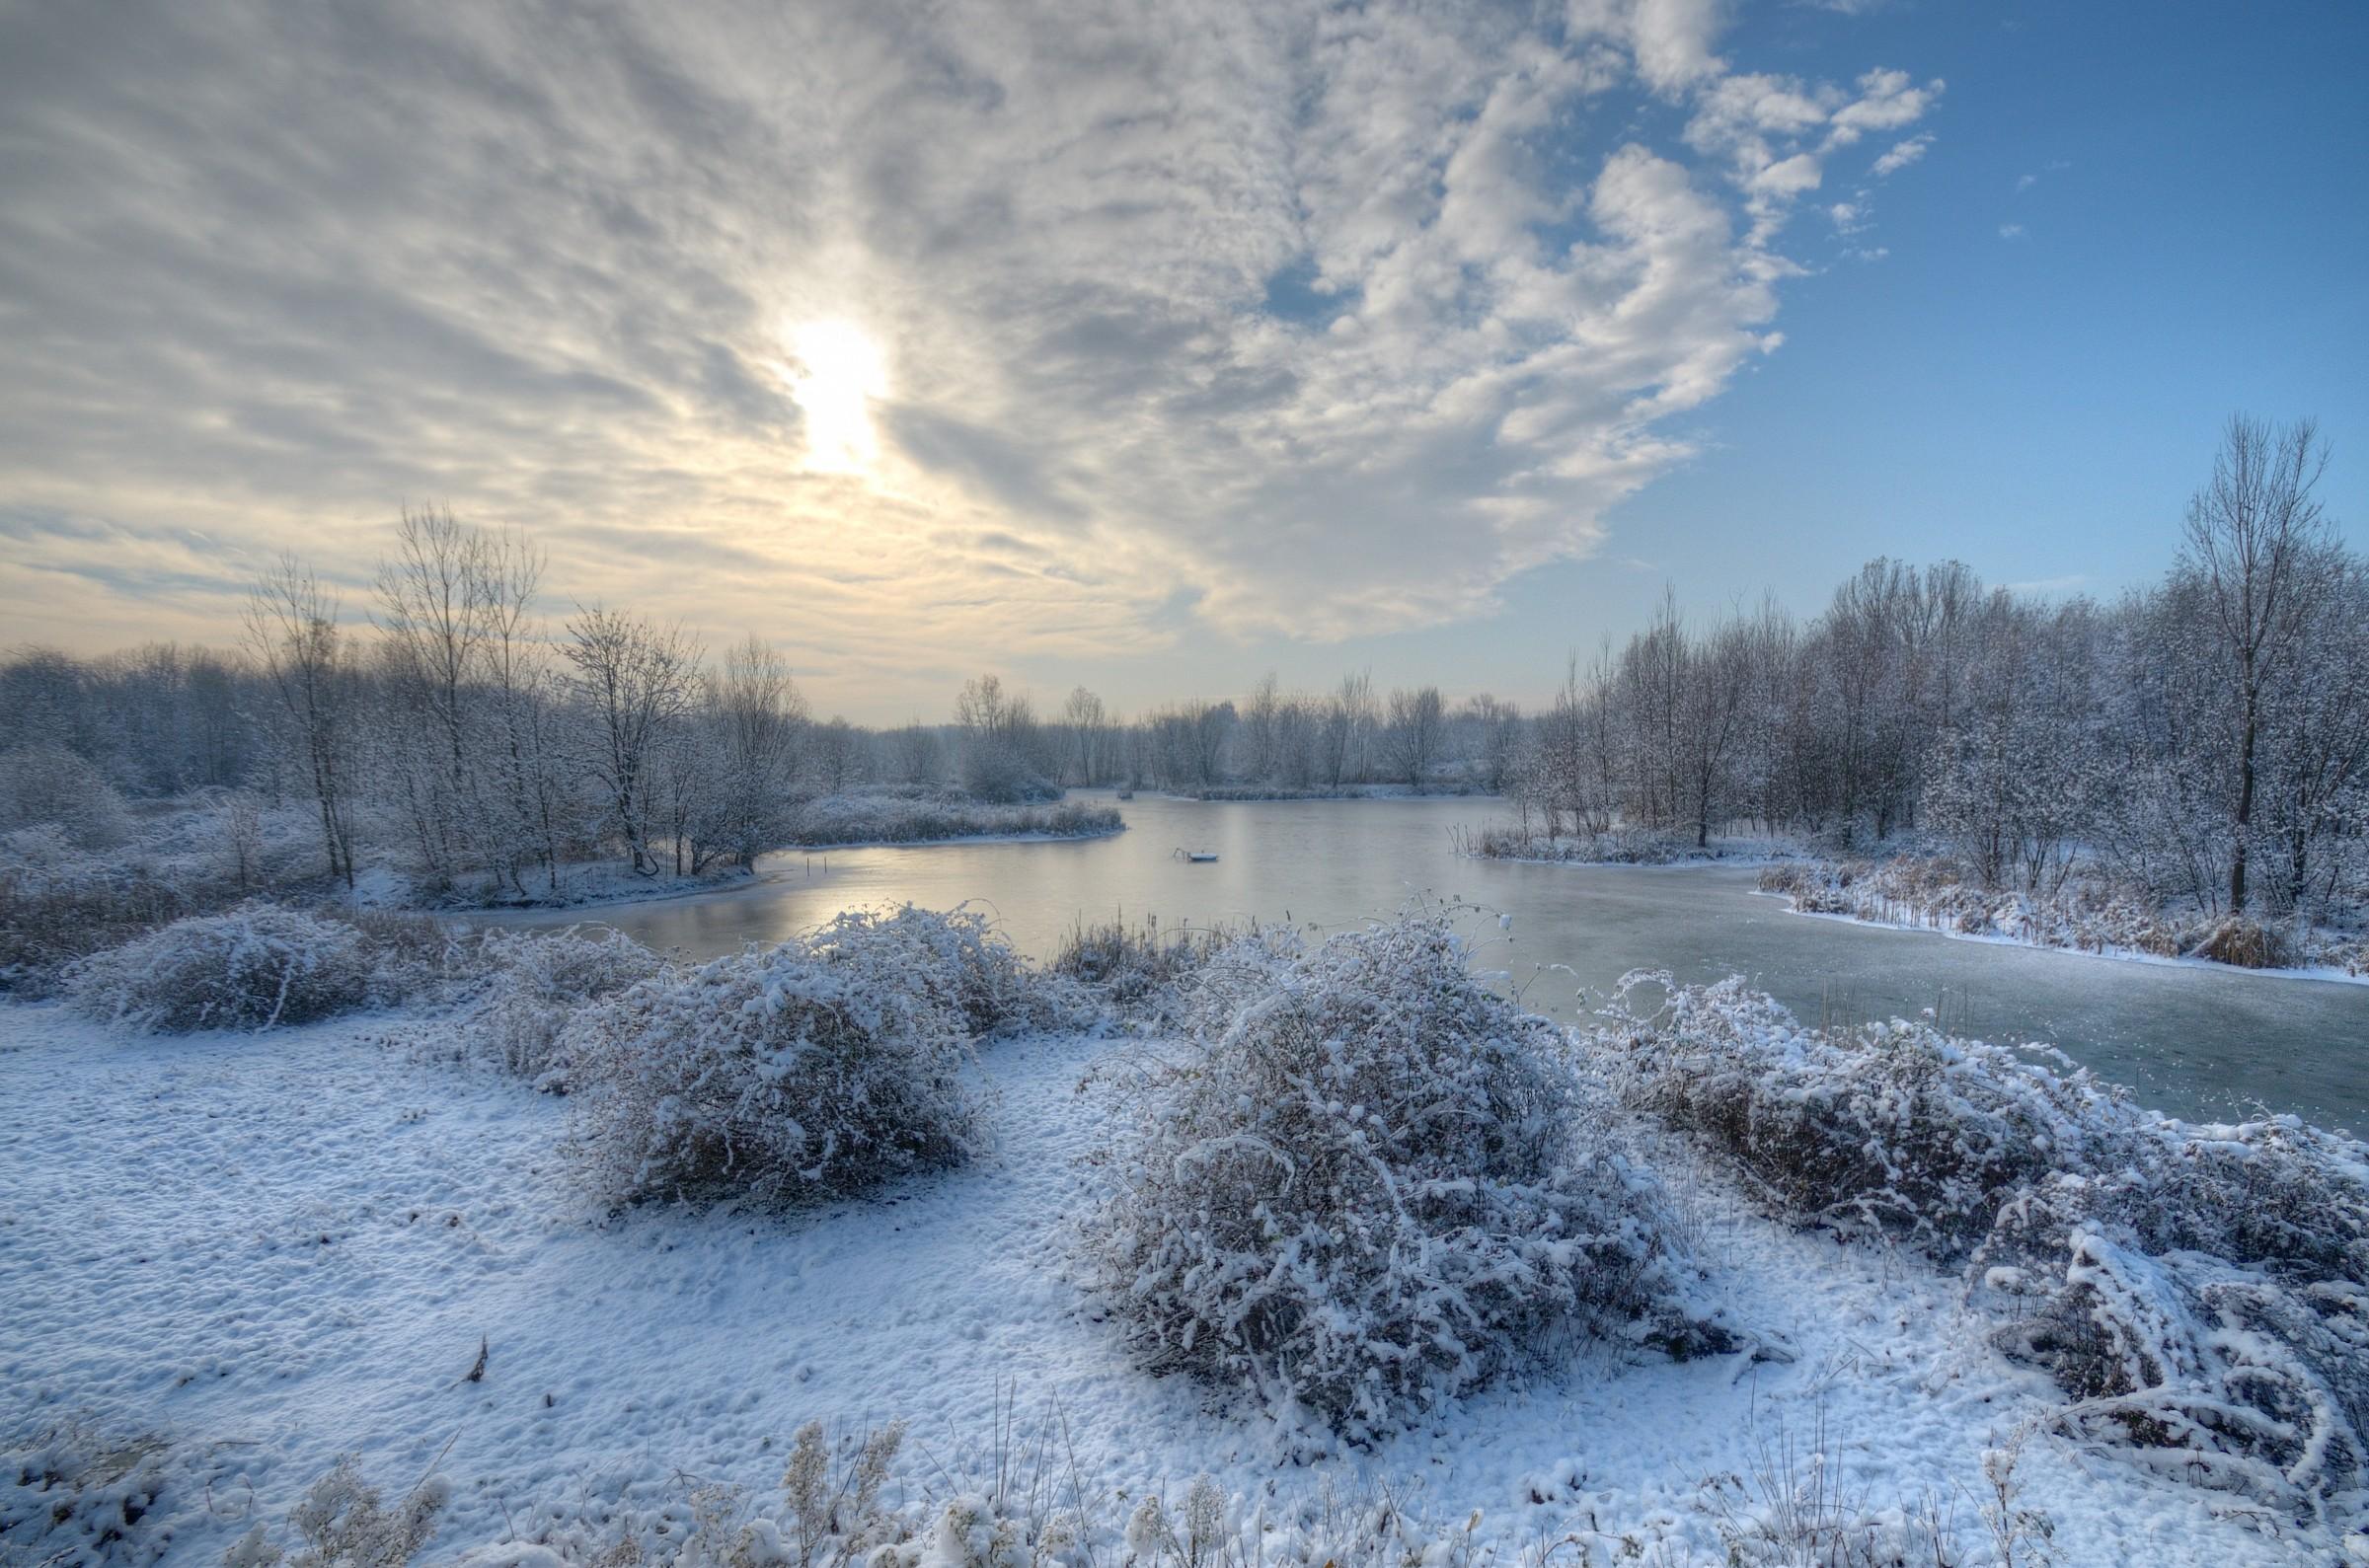 snowy landscape oasis Lipu Cesano Maderno...